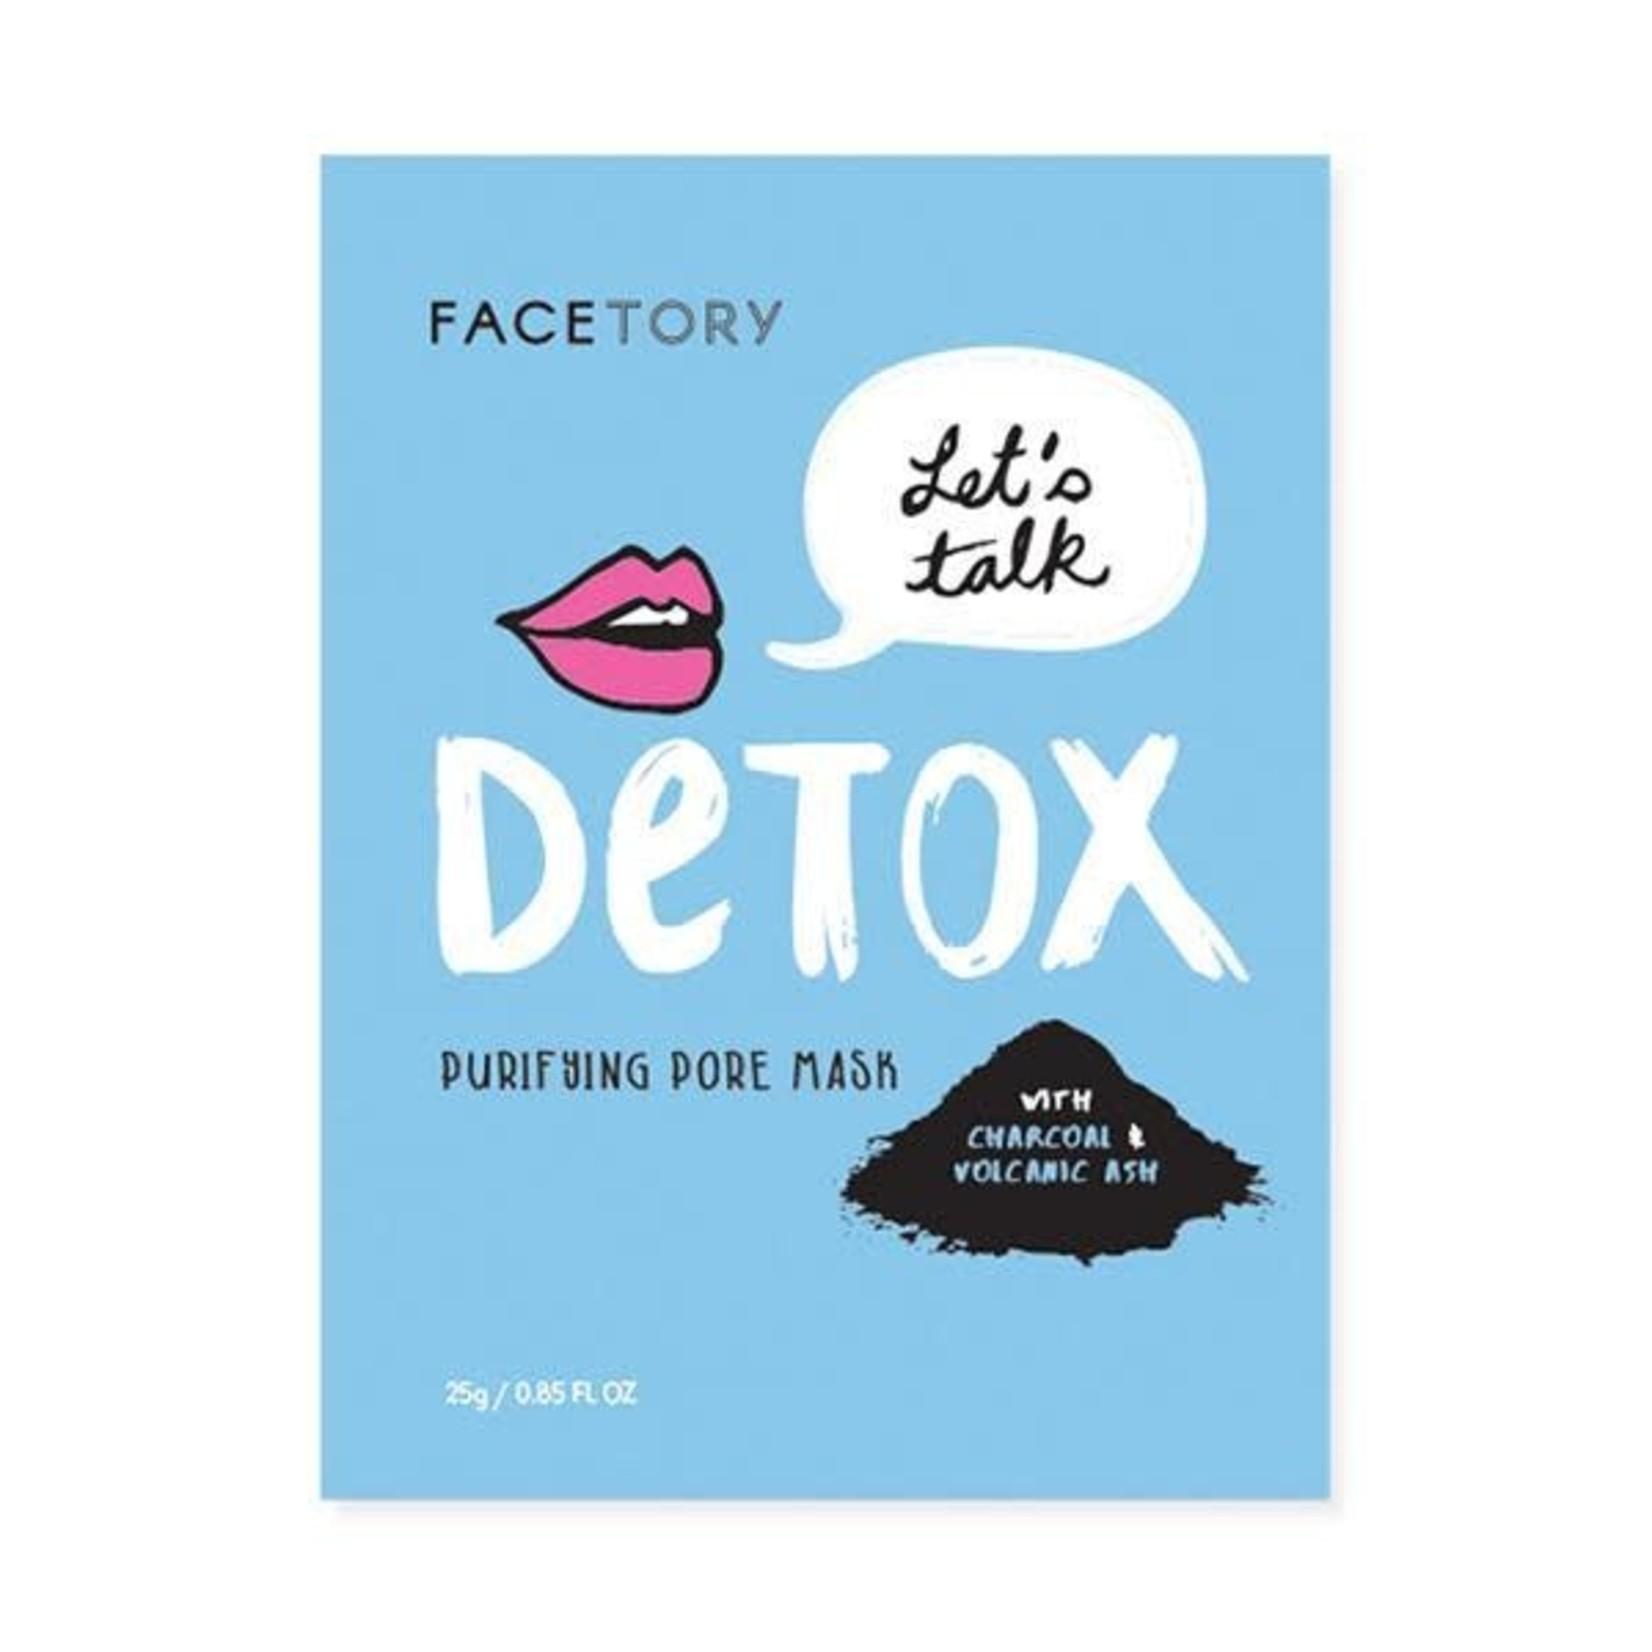 facetory Let's Talk Detox Purifying Pore Mask